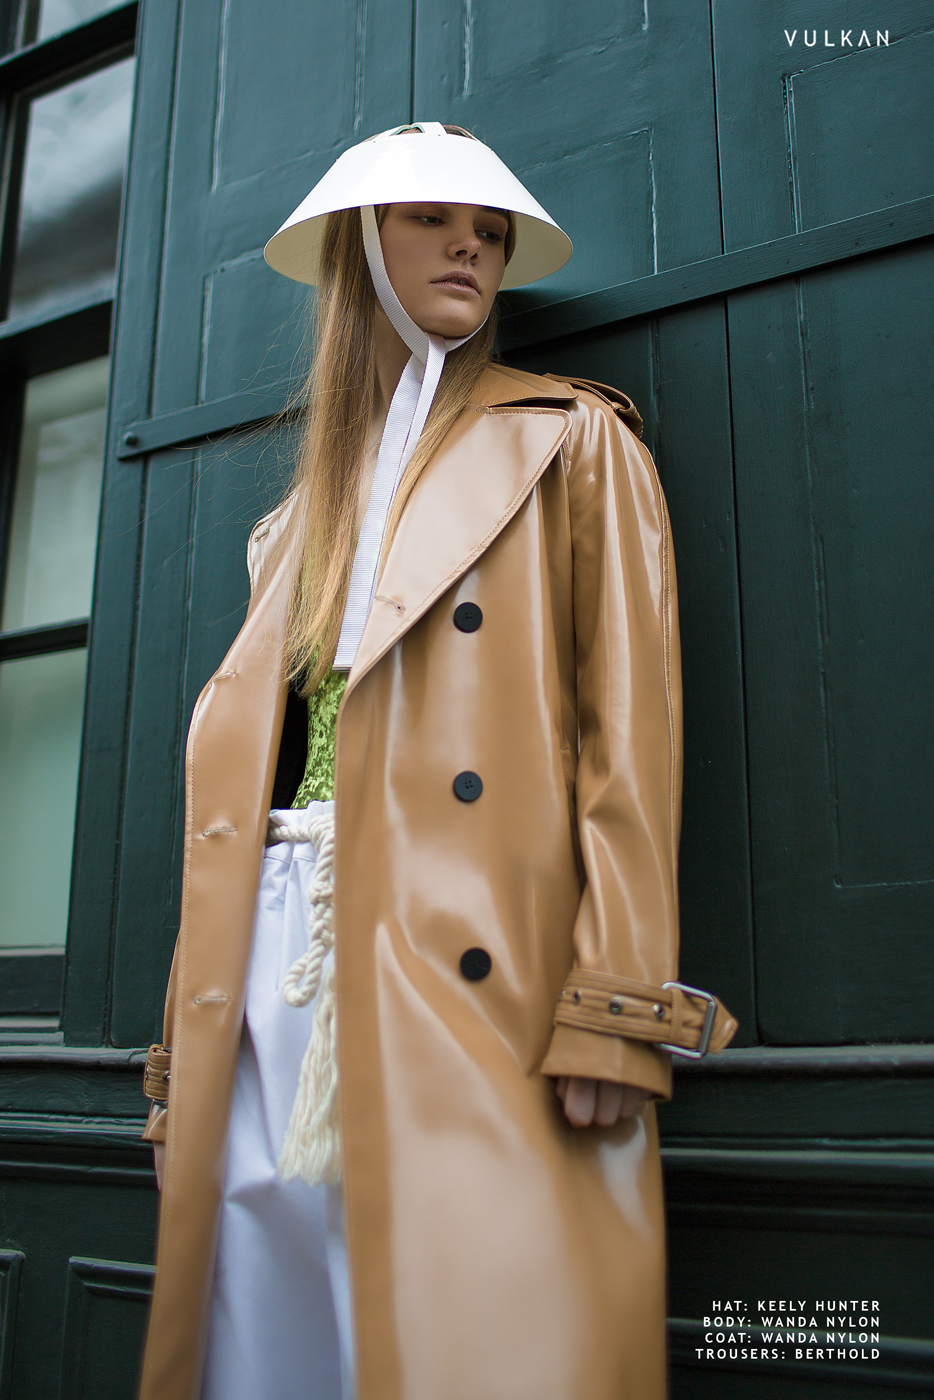 Tie Sun Hat - Vulcan Magazine (Styled by Arianna Cavallo)